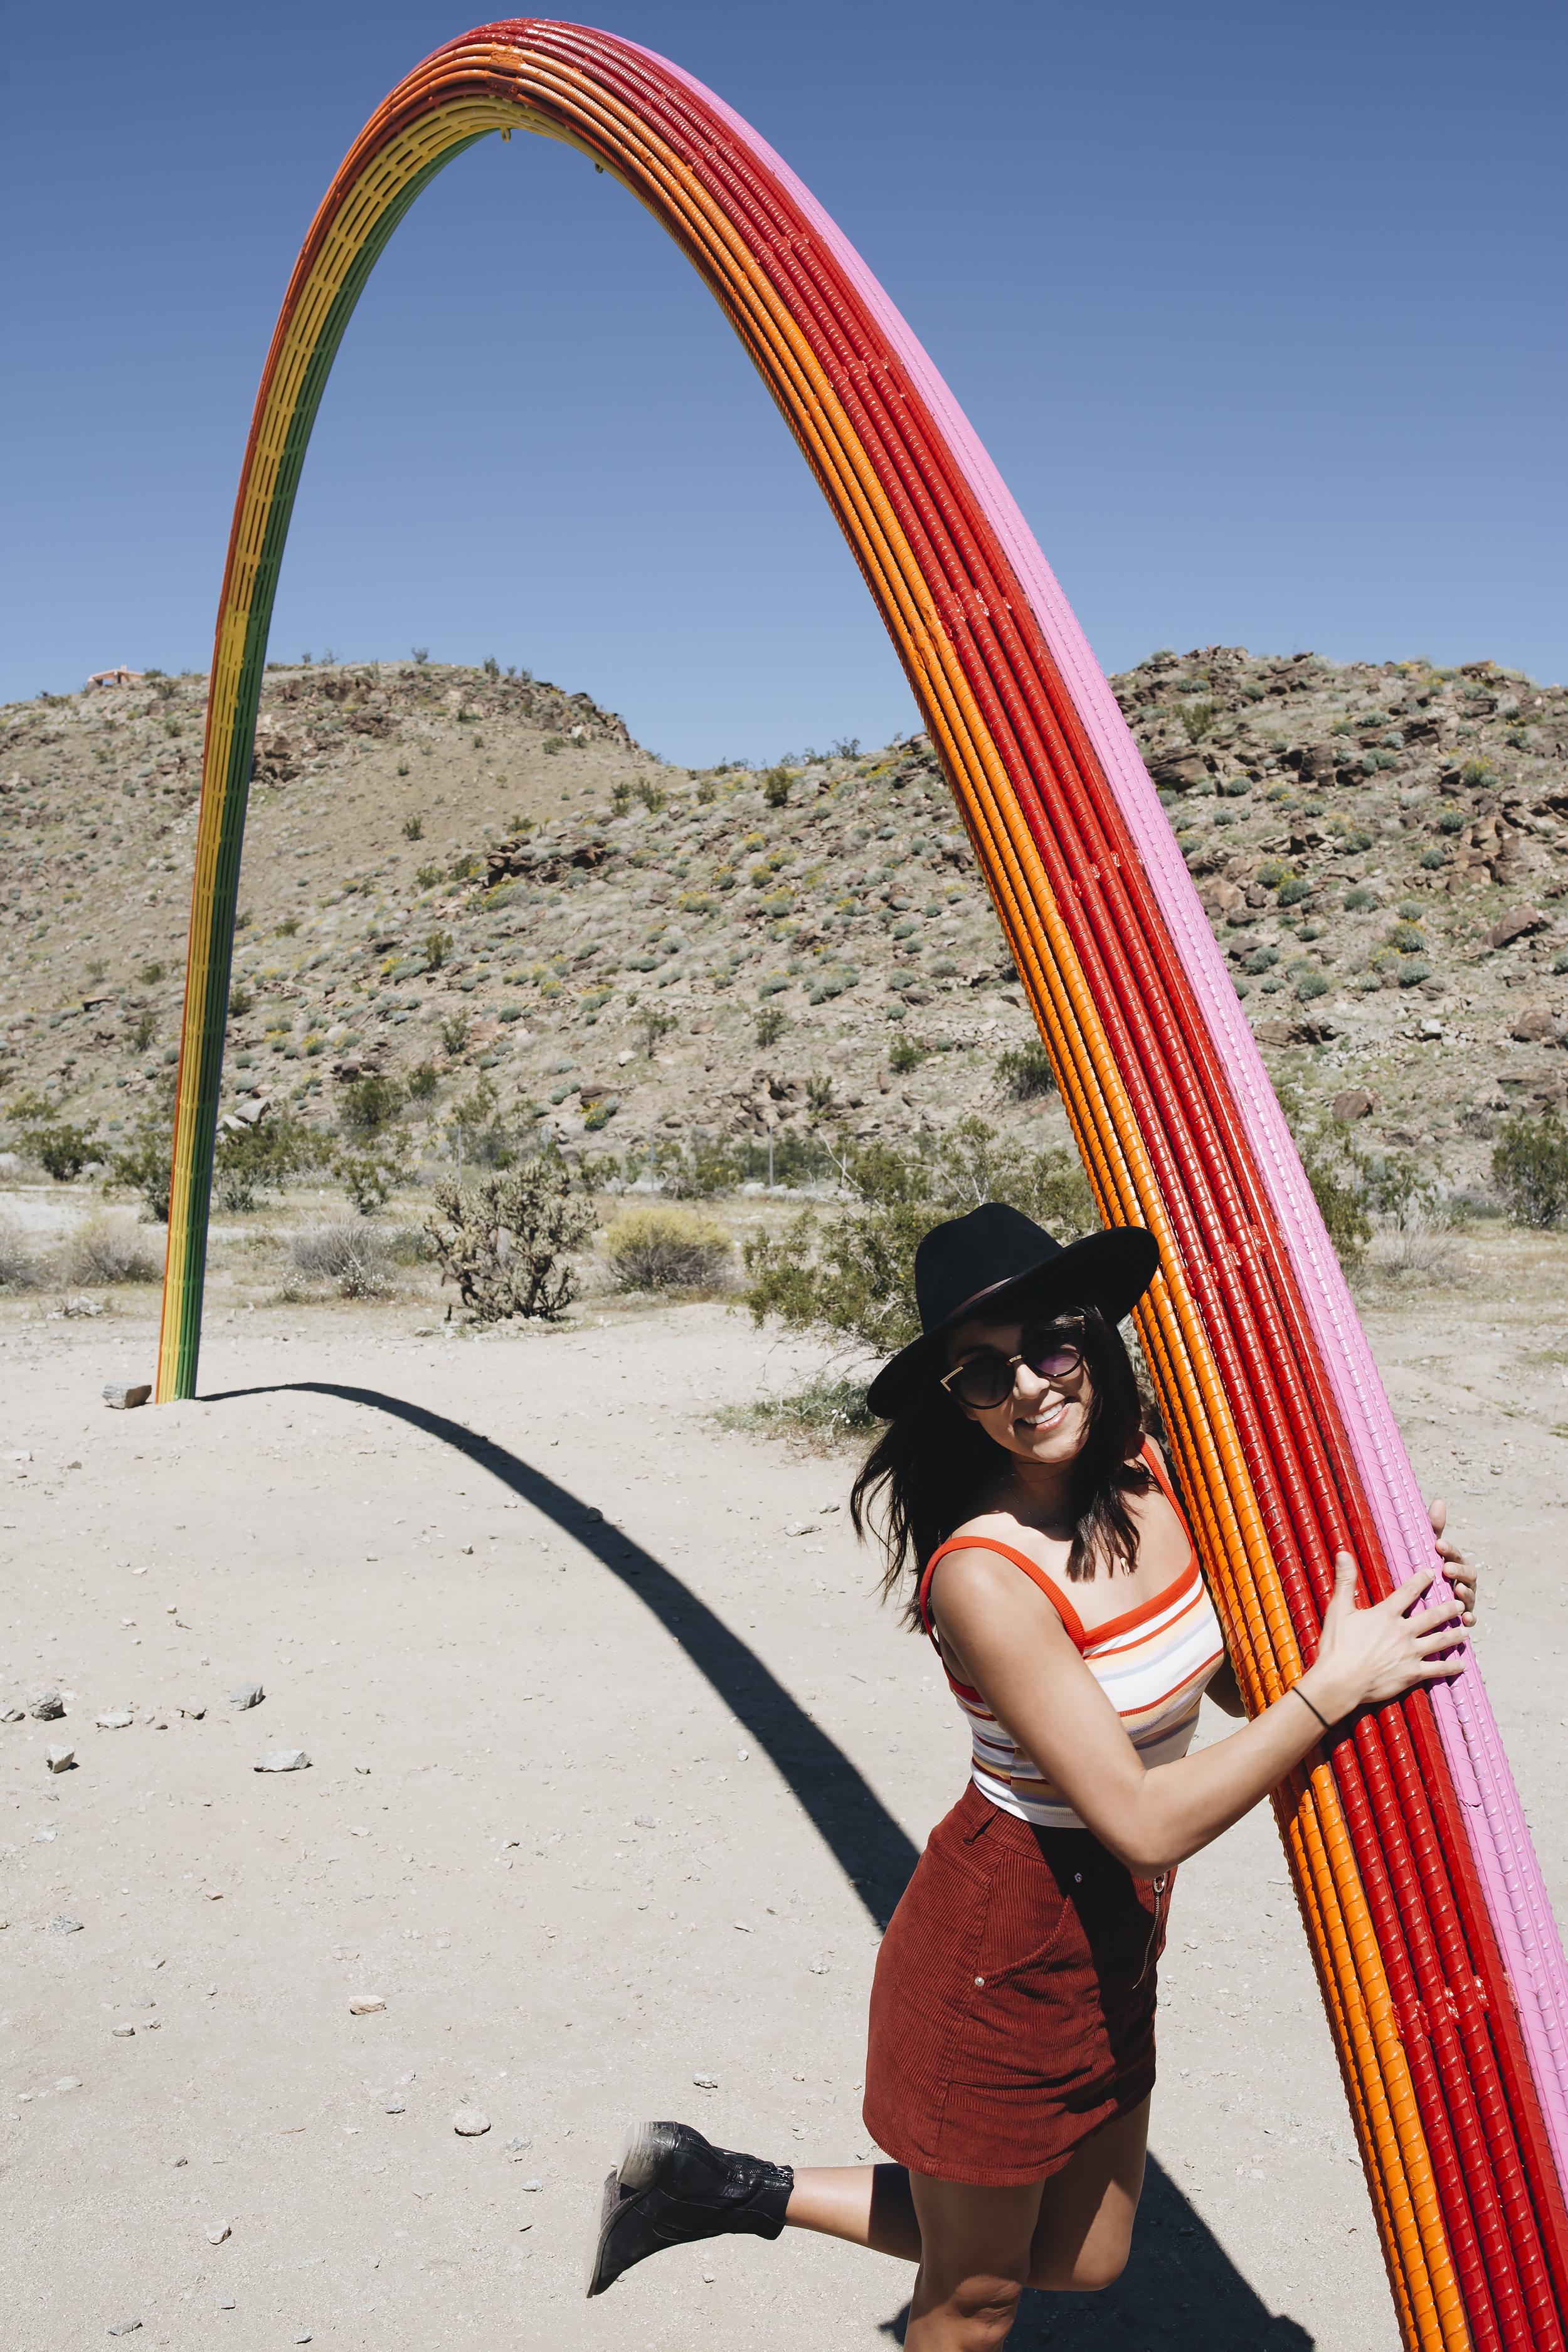 chrissihernandez-california-palmsprings-desertx-loversrainbow (22)copy2500.jpg